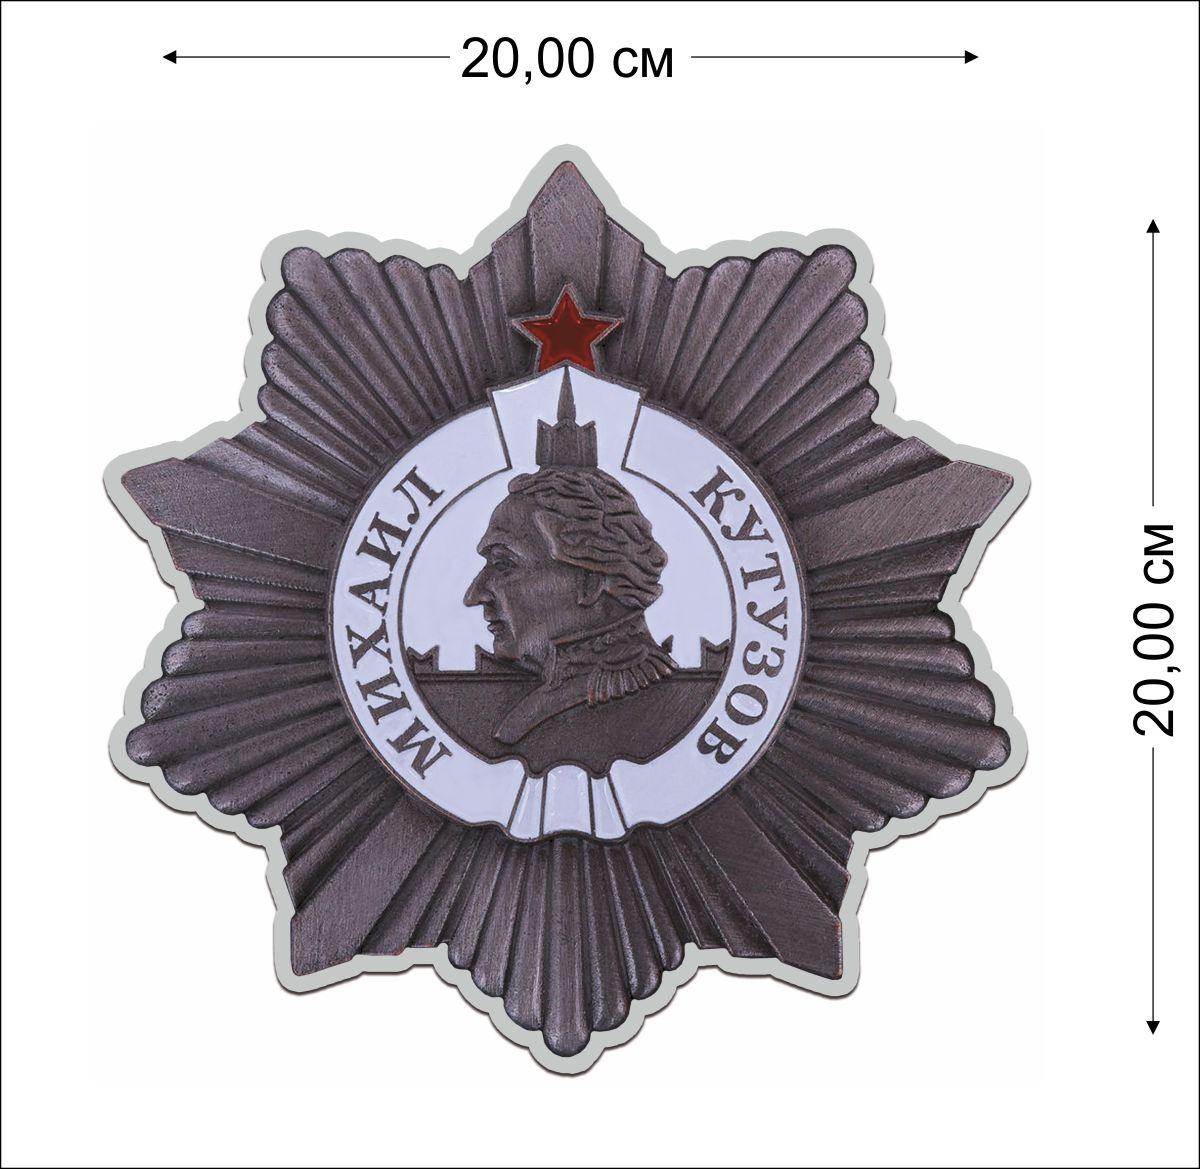 Наклейка с орденом Кутузова 2 степени